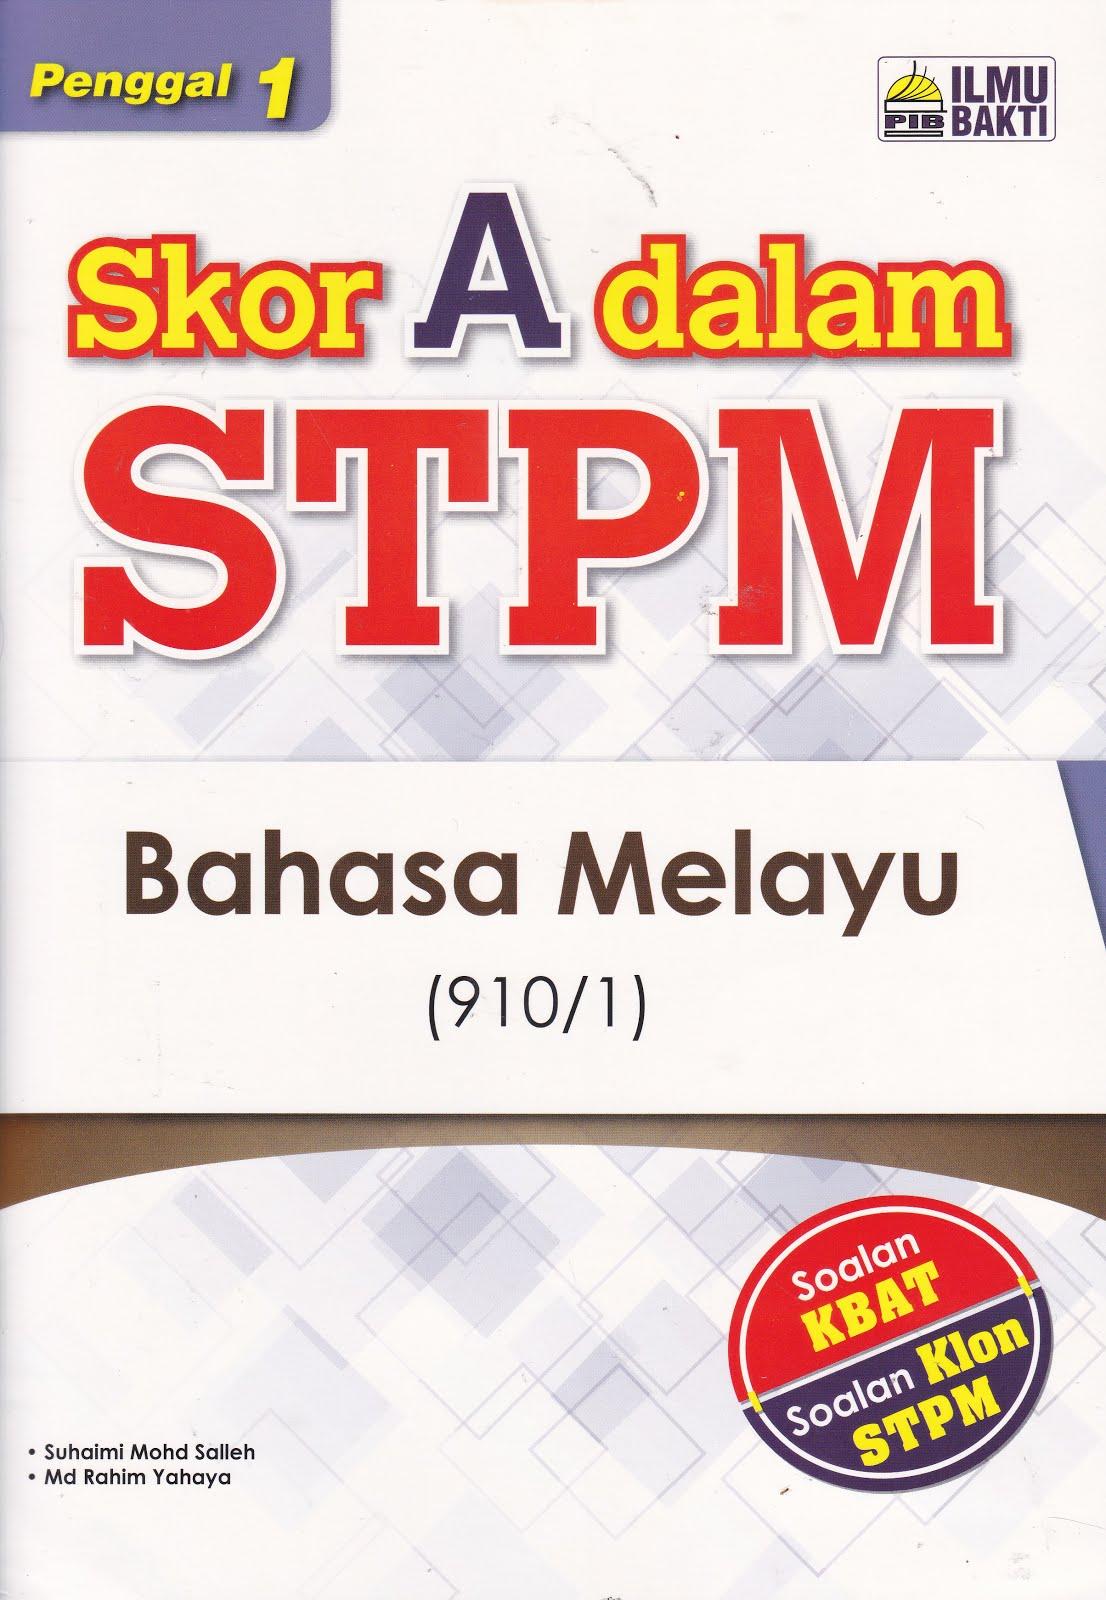 Soalan Stpm Sebenar Semester 1 Dermaga Bm Stpm